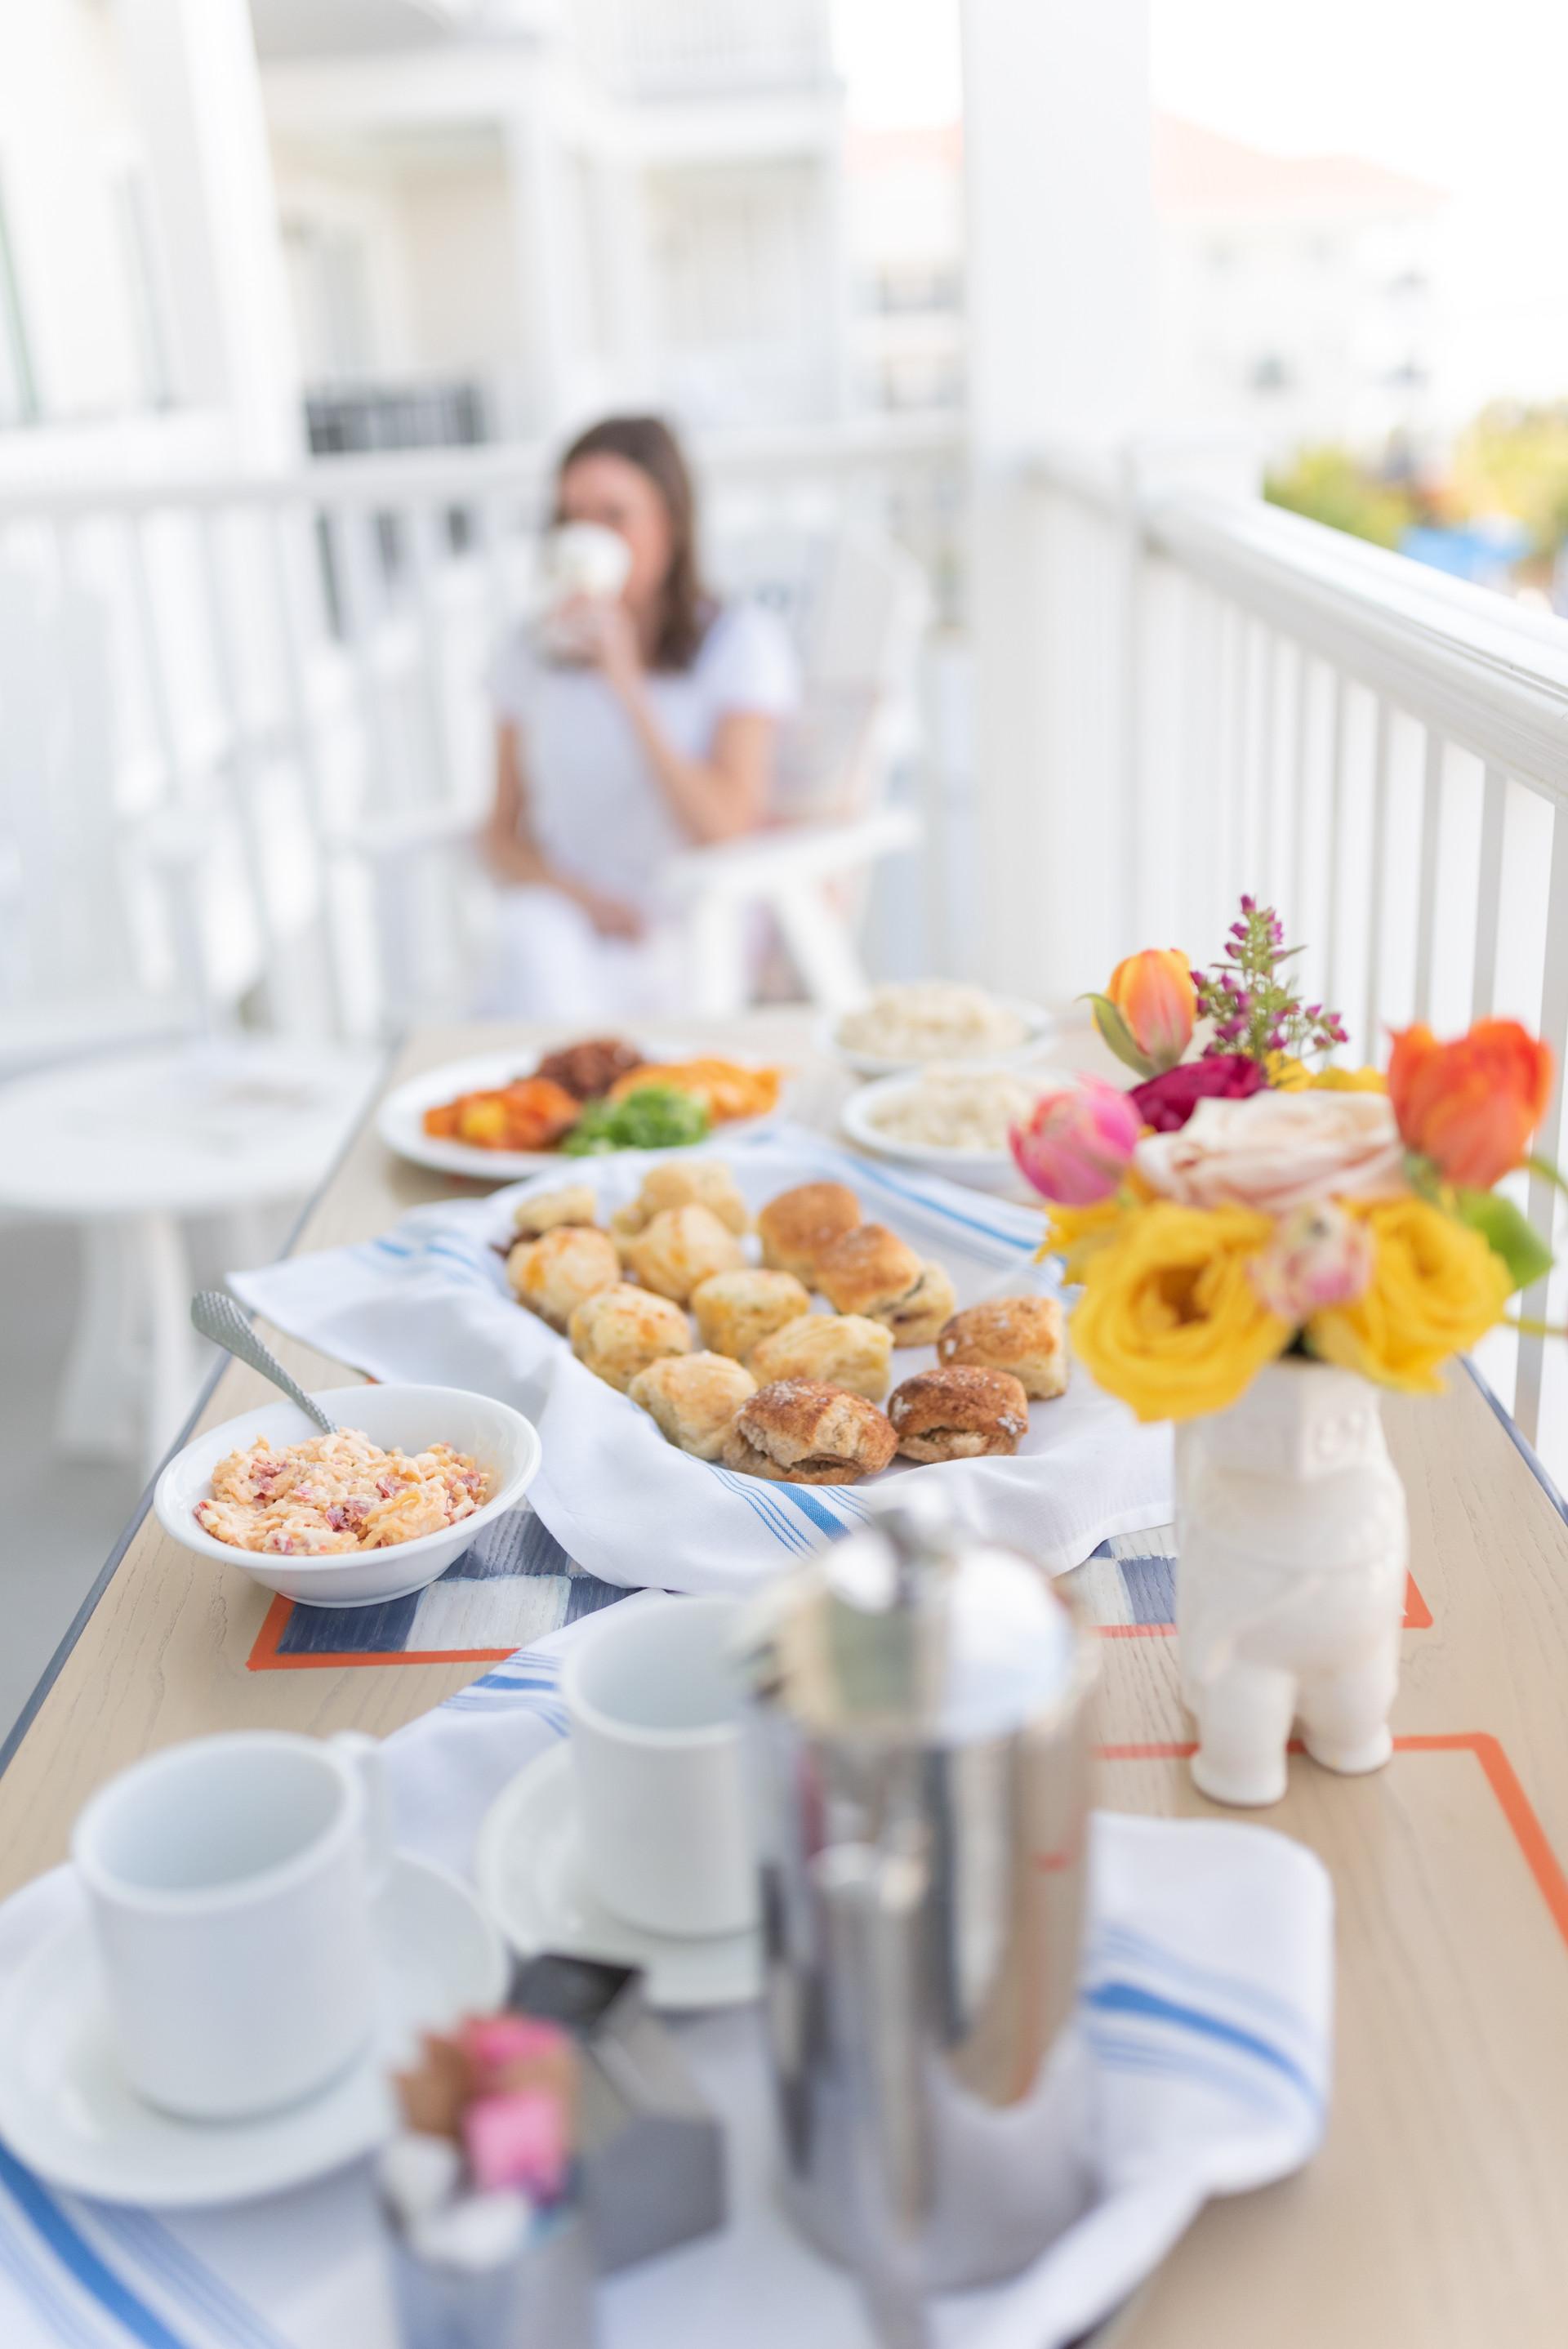 TSC-Ladies-Hotel-Callies-May-2019-54.jpg